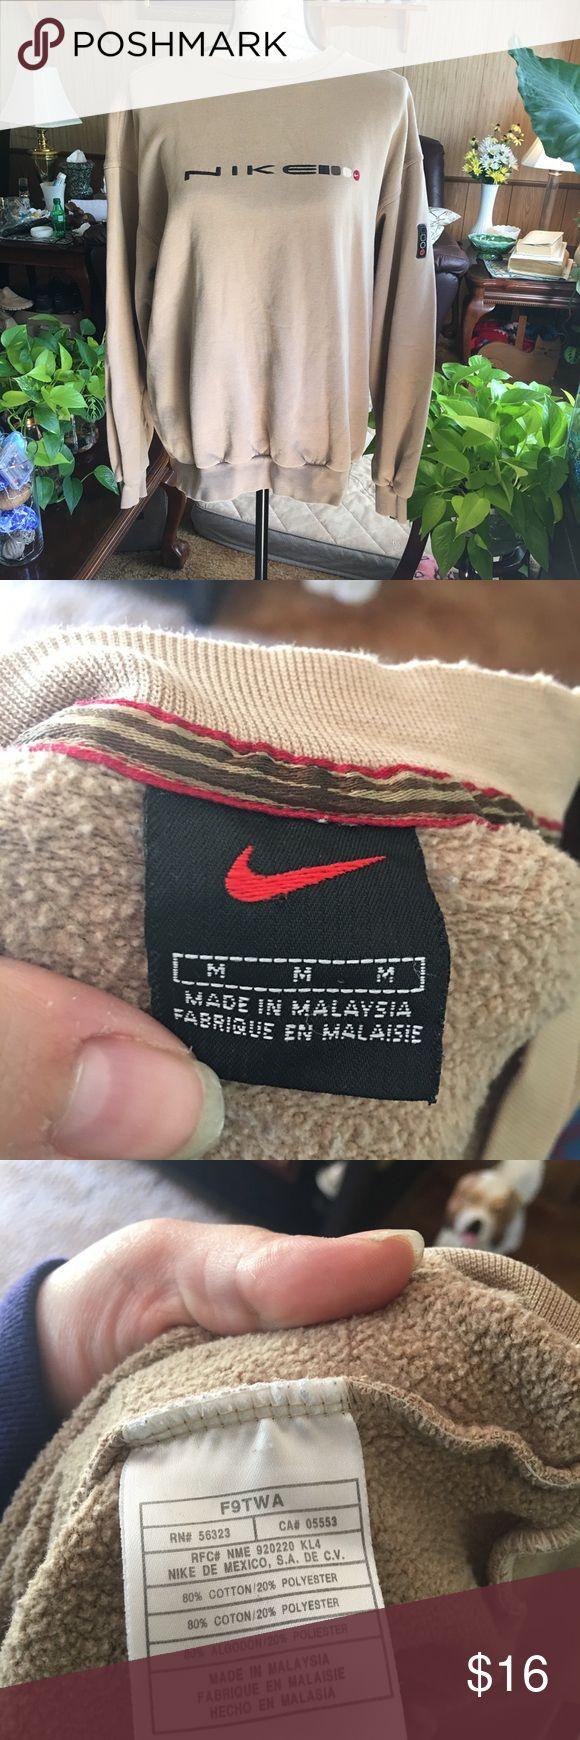 Men S Or Women S Vintage Nike Sweatshirt Vintage Nike Sweatshirt Nike Sweatshirts Vintage Nike [ 1740 x 580 Pixel ]